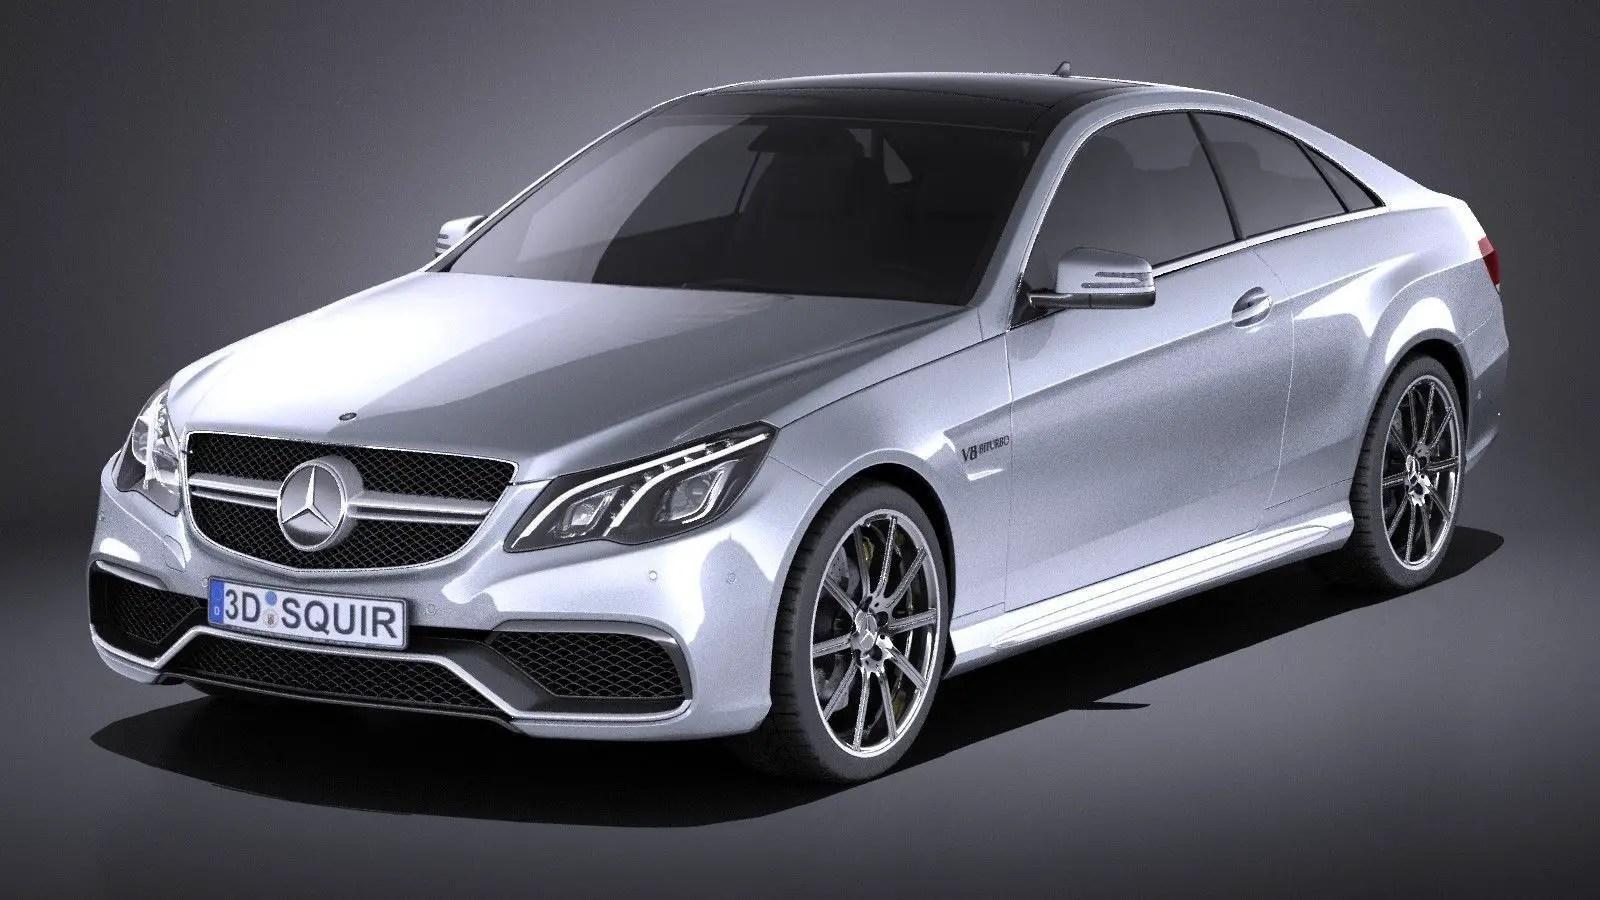 Download Mercedes-Benz AMG Car Mod for Bus Simulator Indonesia, Mercedes Benz AMG, BUSSID mod, Car Mod, Mod for BUSSID, SGCArena, Vehicle Mod